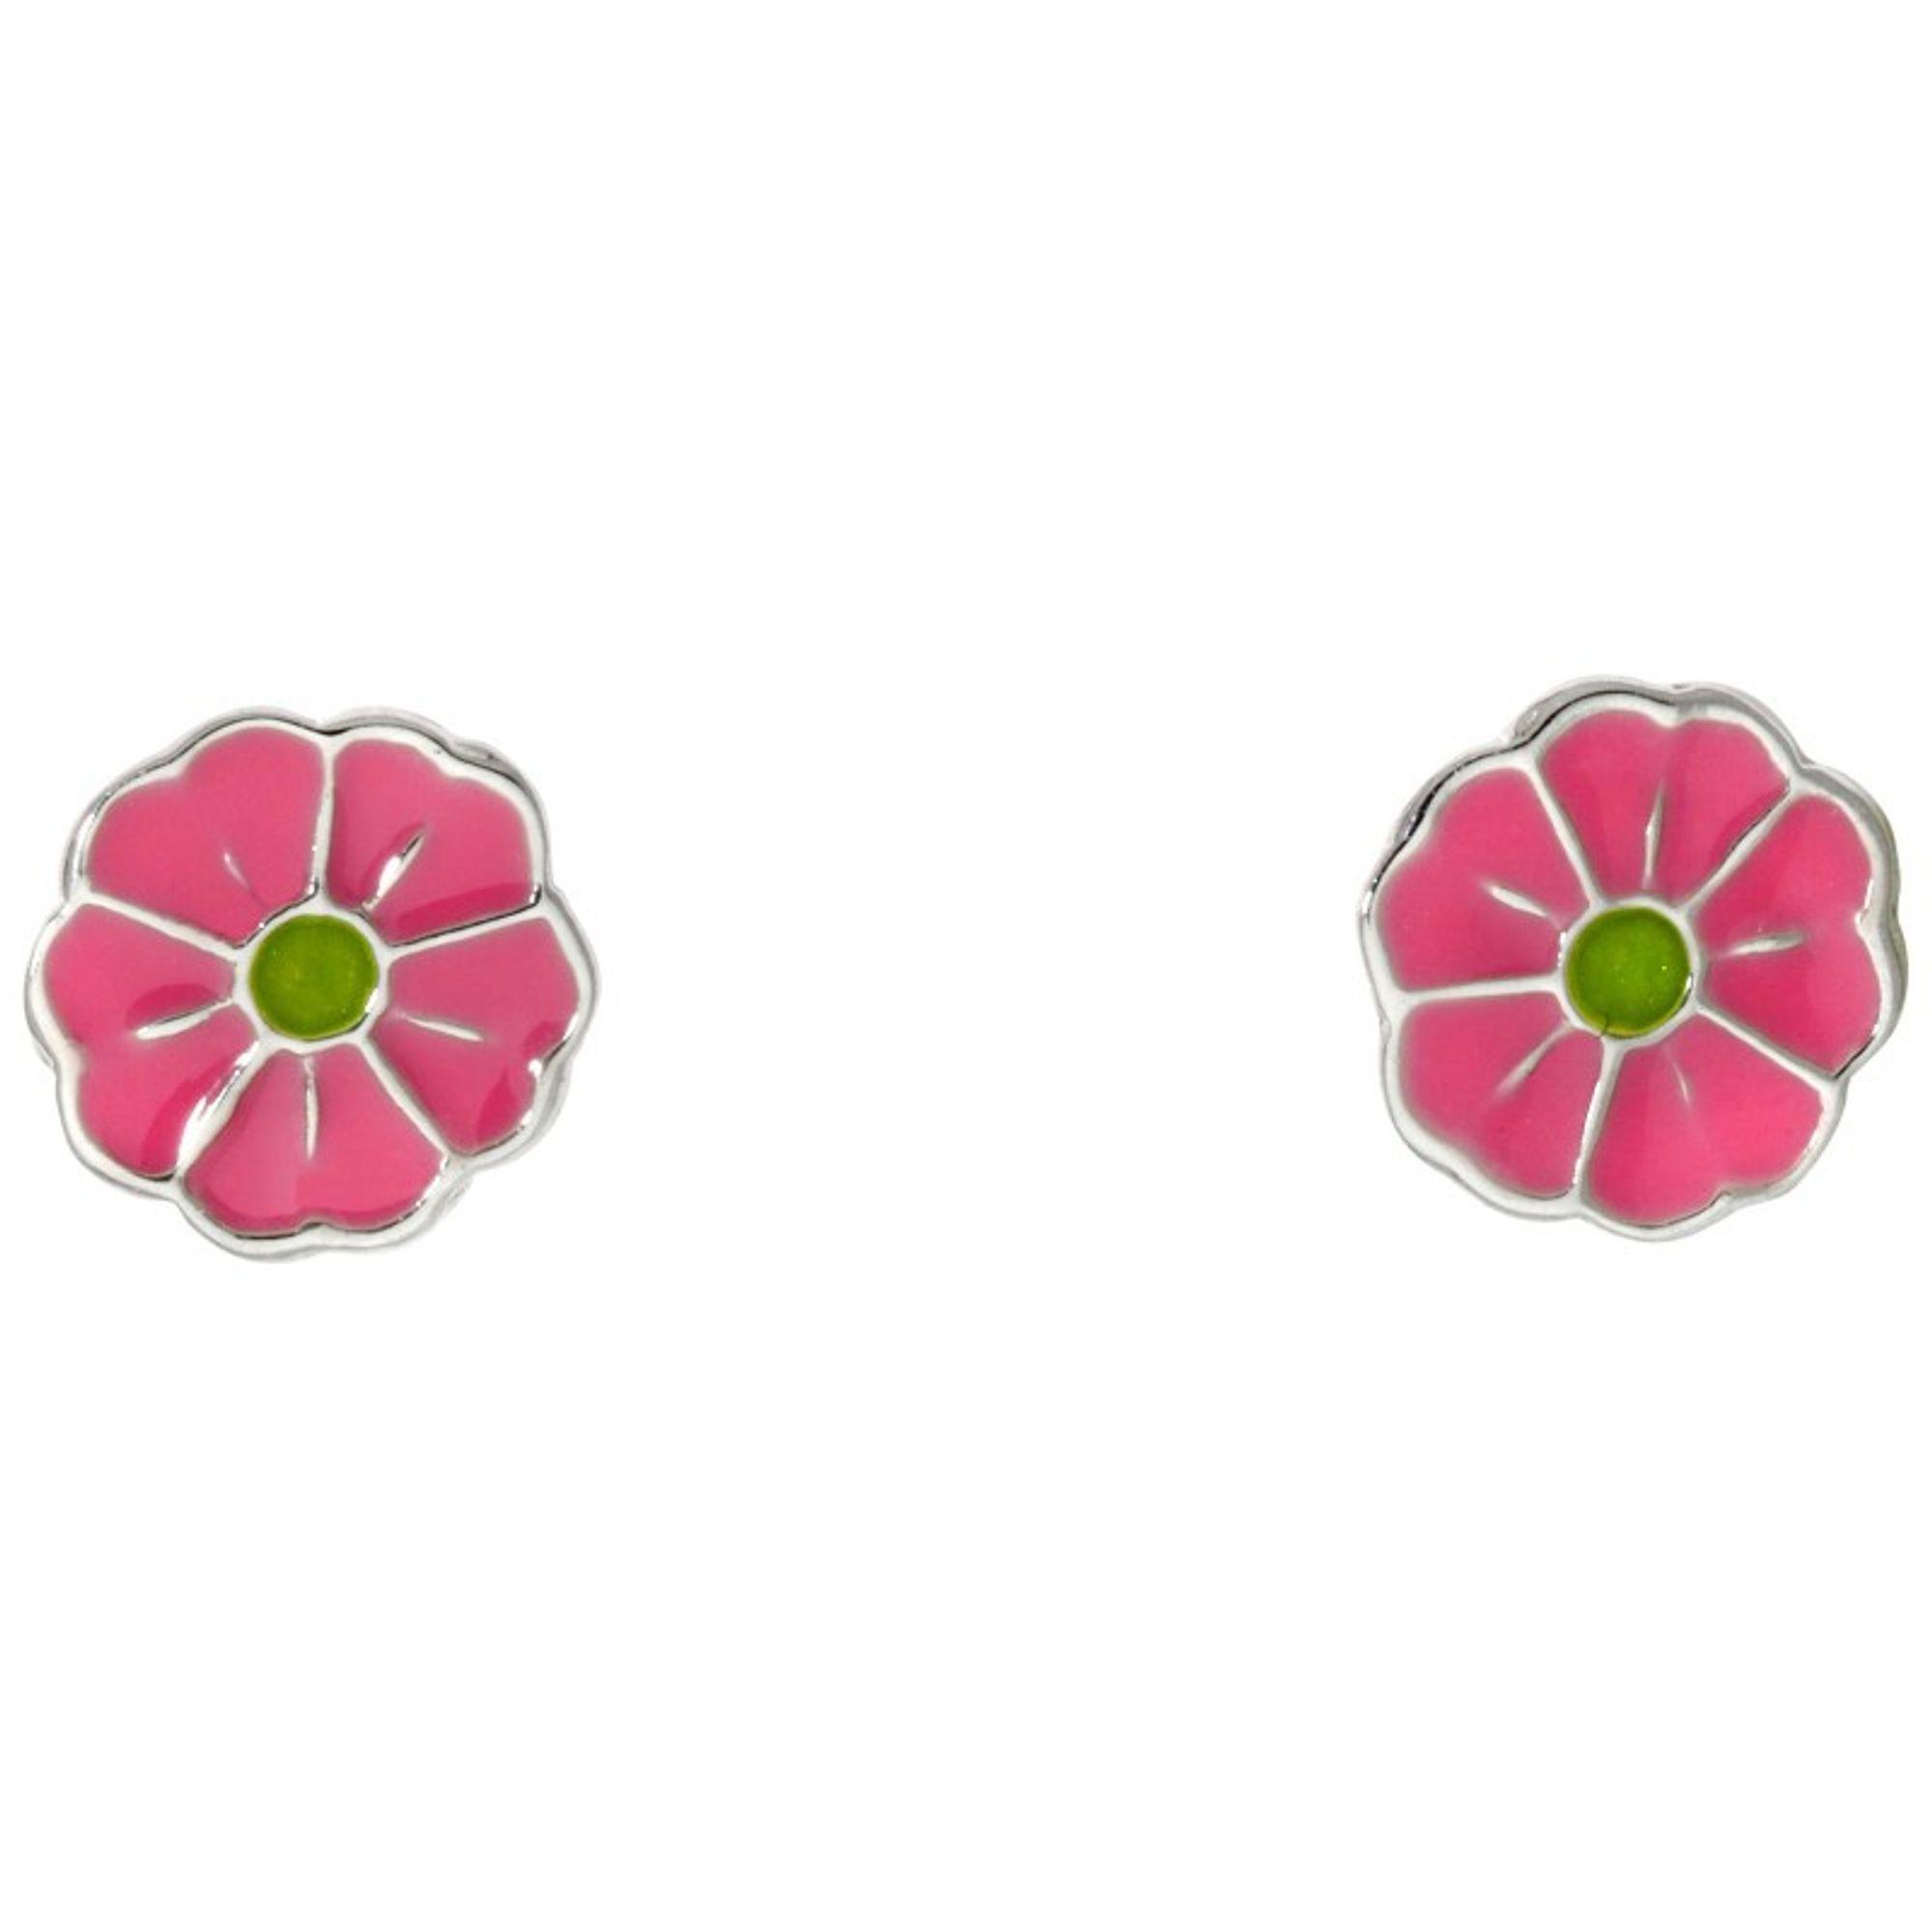 Basic Silber SK24 Kinder Ohrschmuck Blume Silber grün rosa